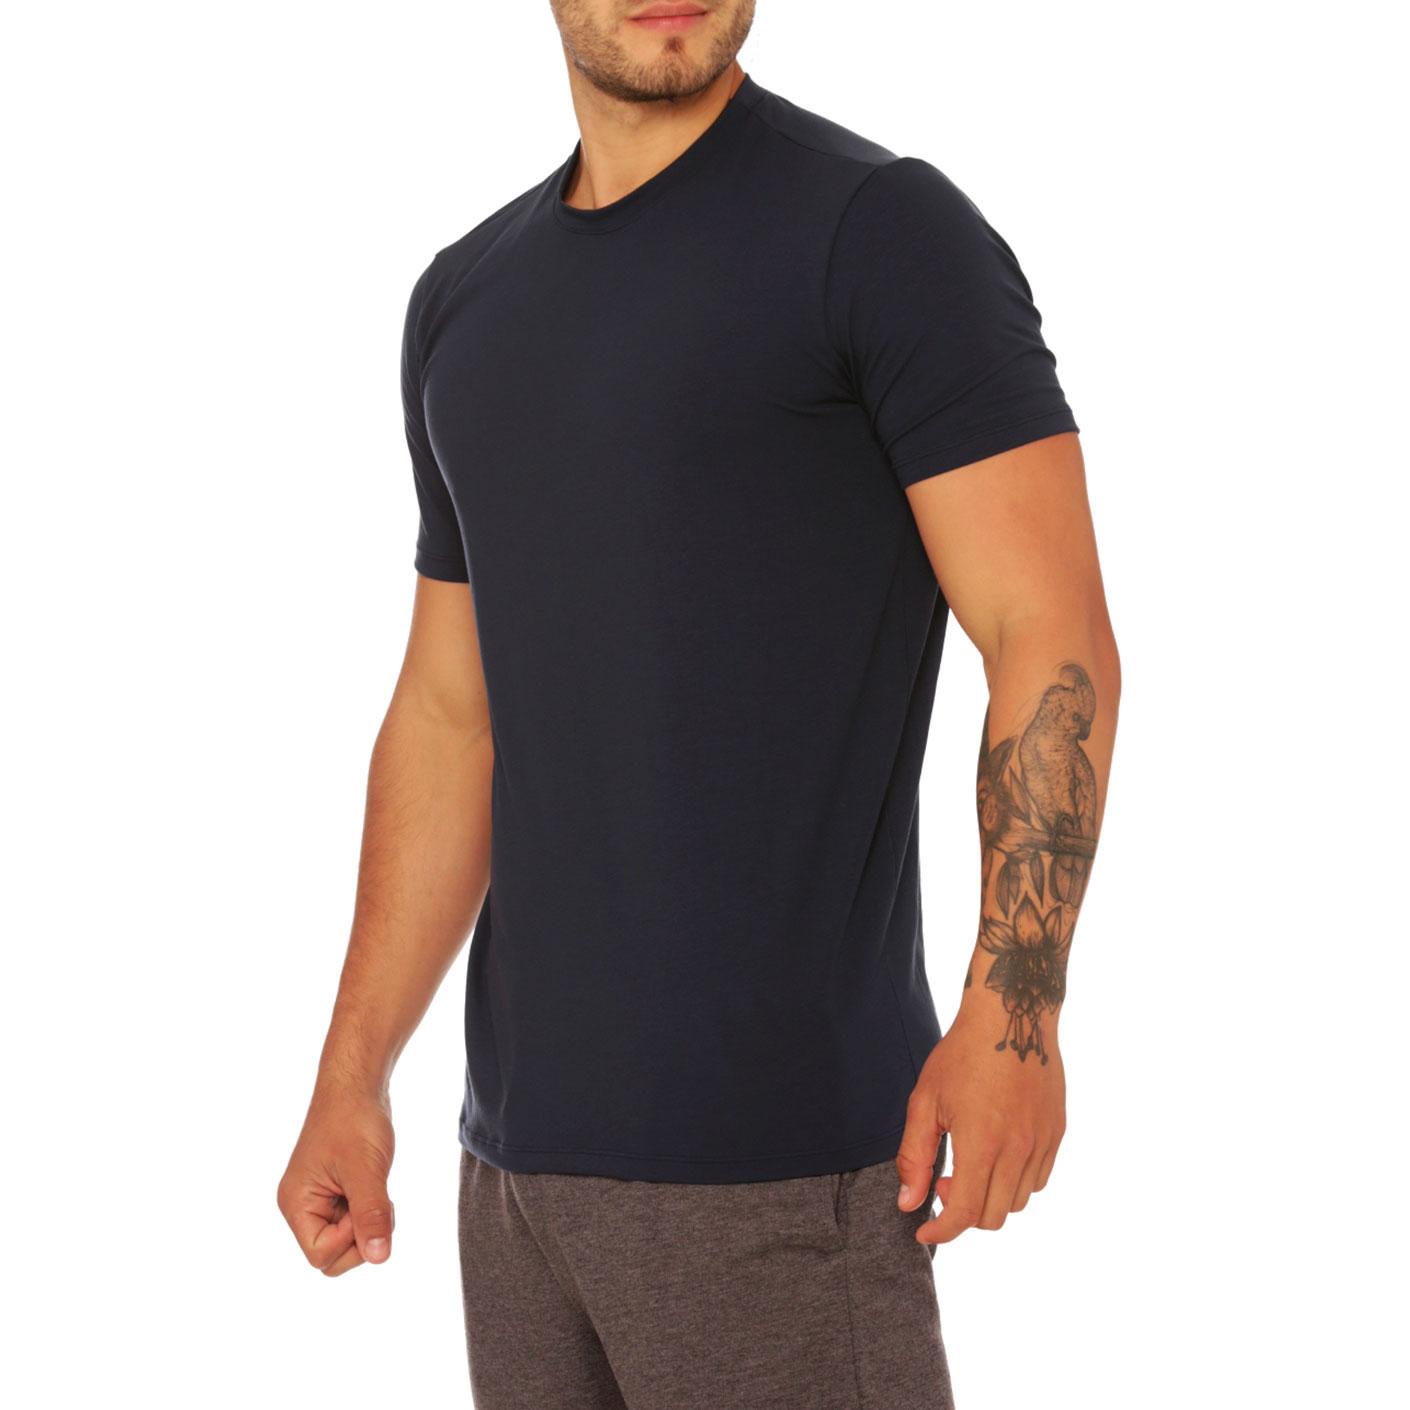 Mundo Unico Comfort Wear T-Shirt   Blue